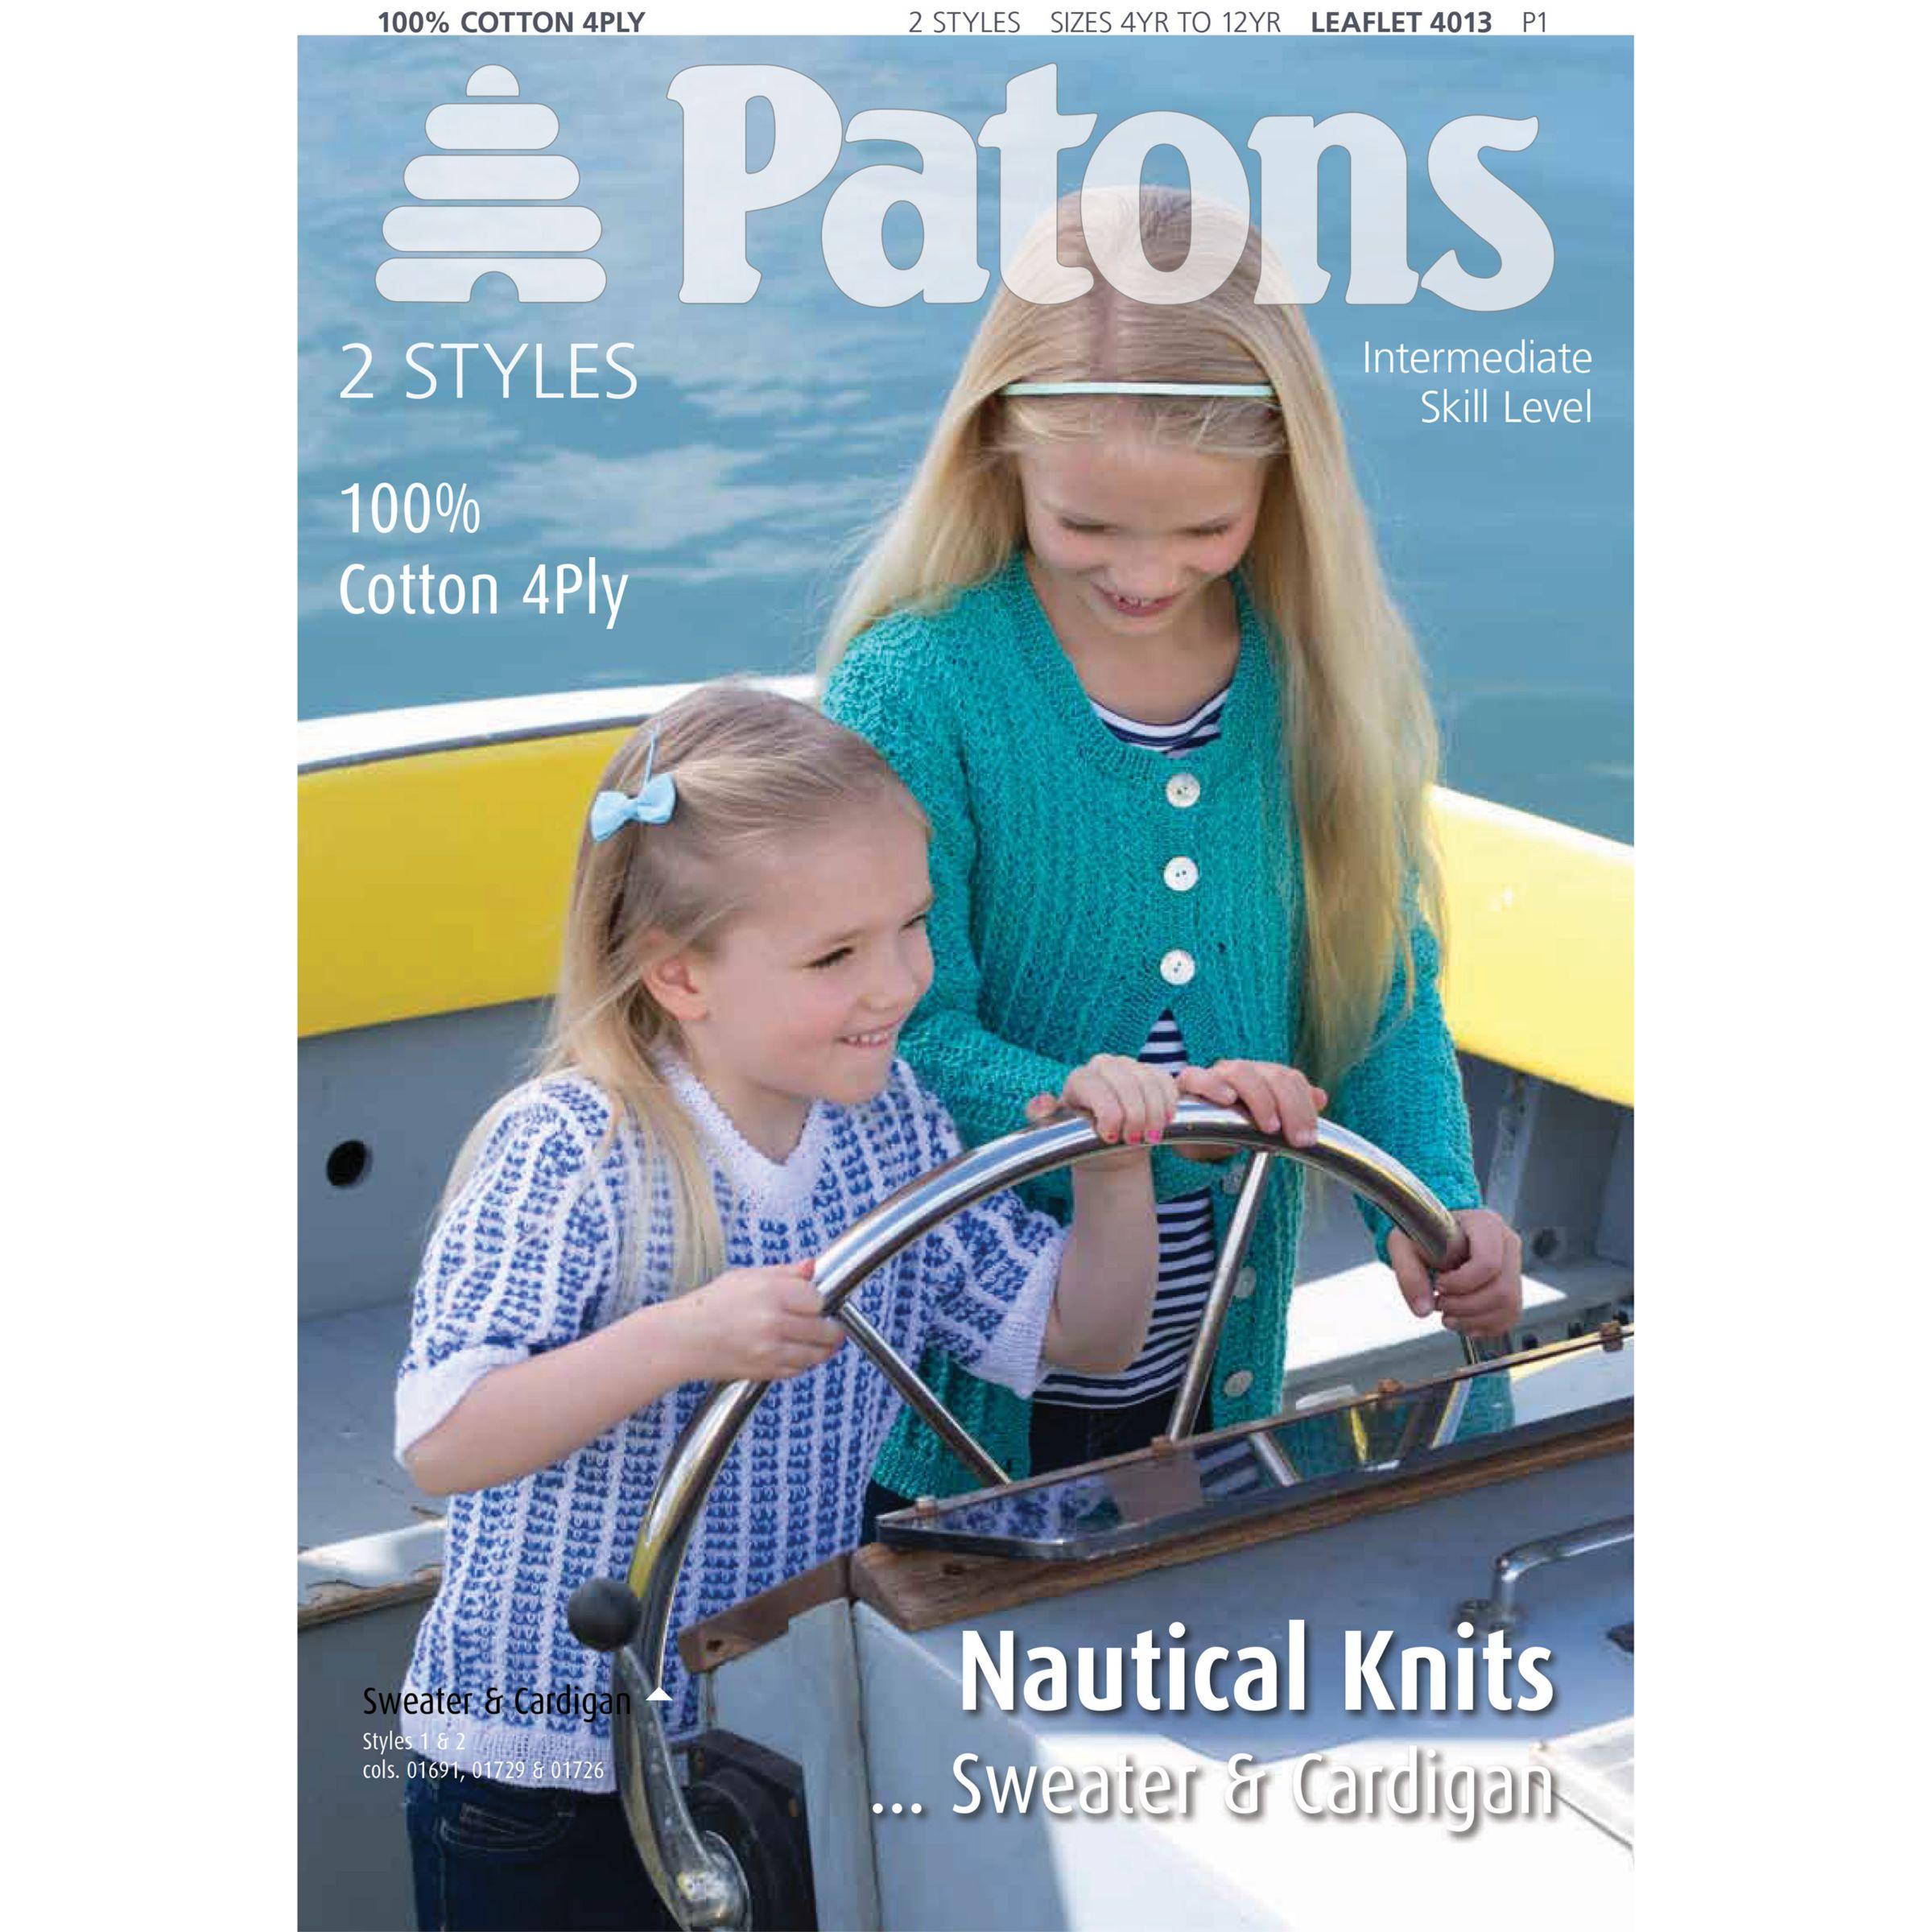 Patons Patons 100% Cotton 4 Ply Nautical Sweater and Cardigan Knitting Pattern, 4013